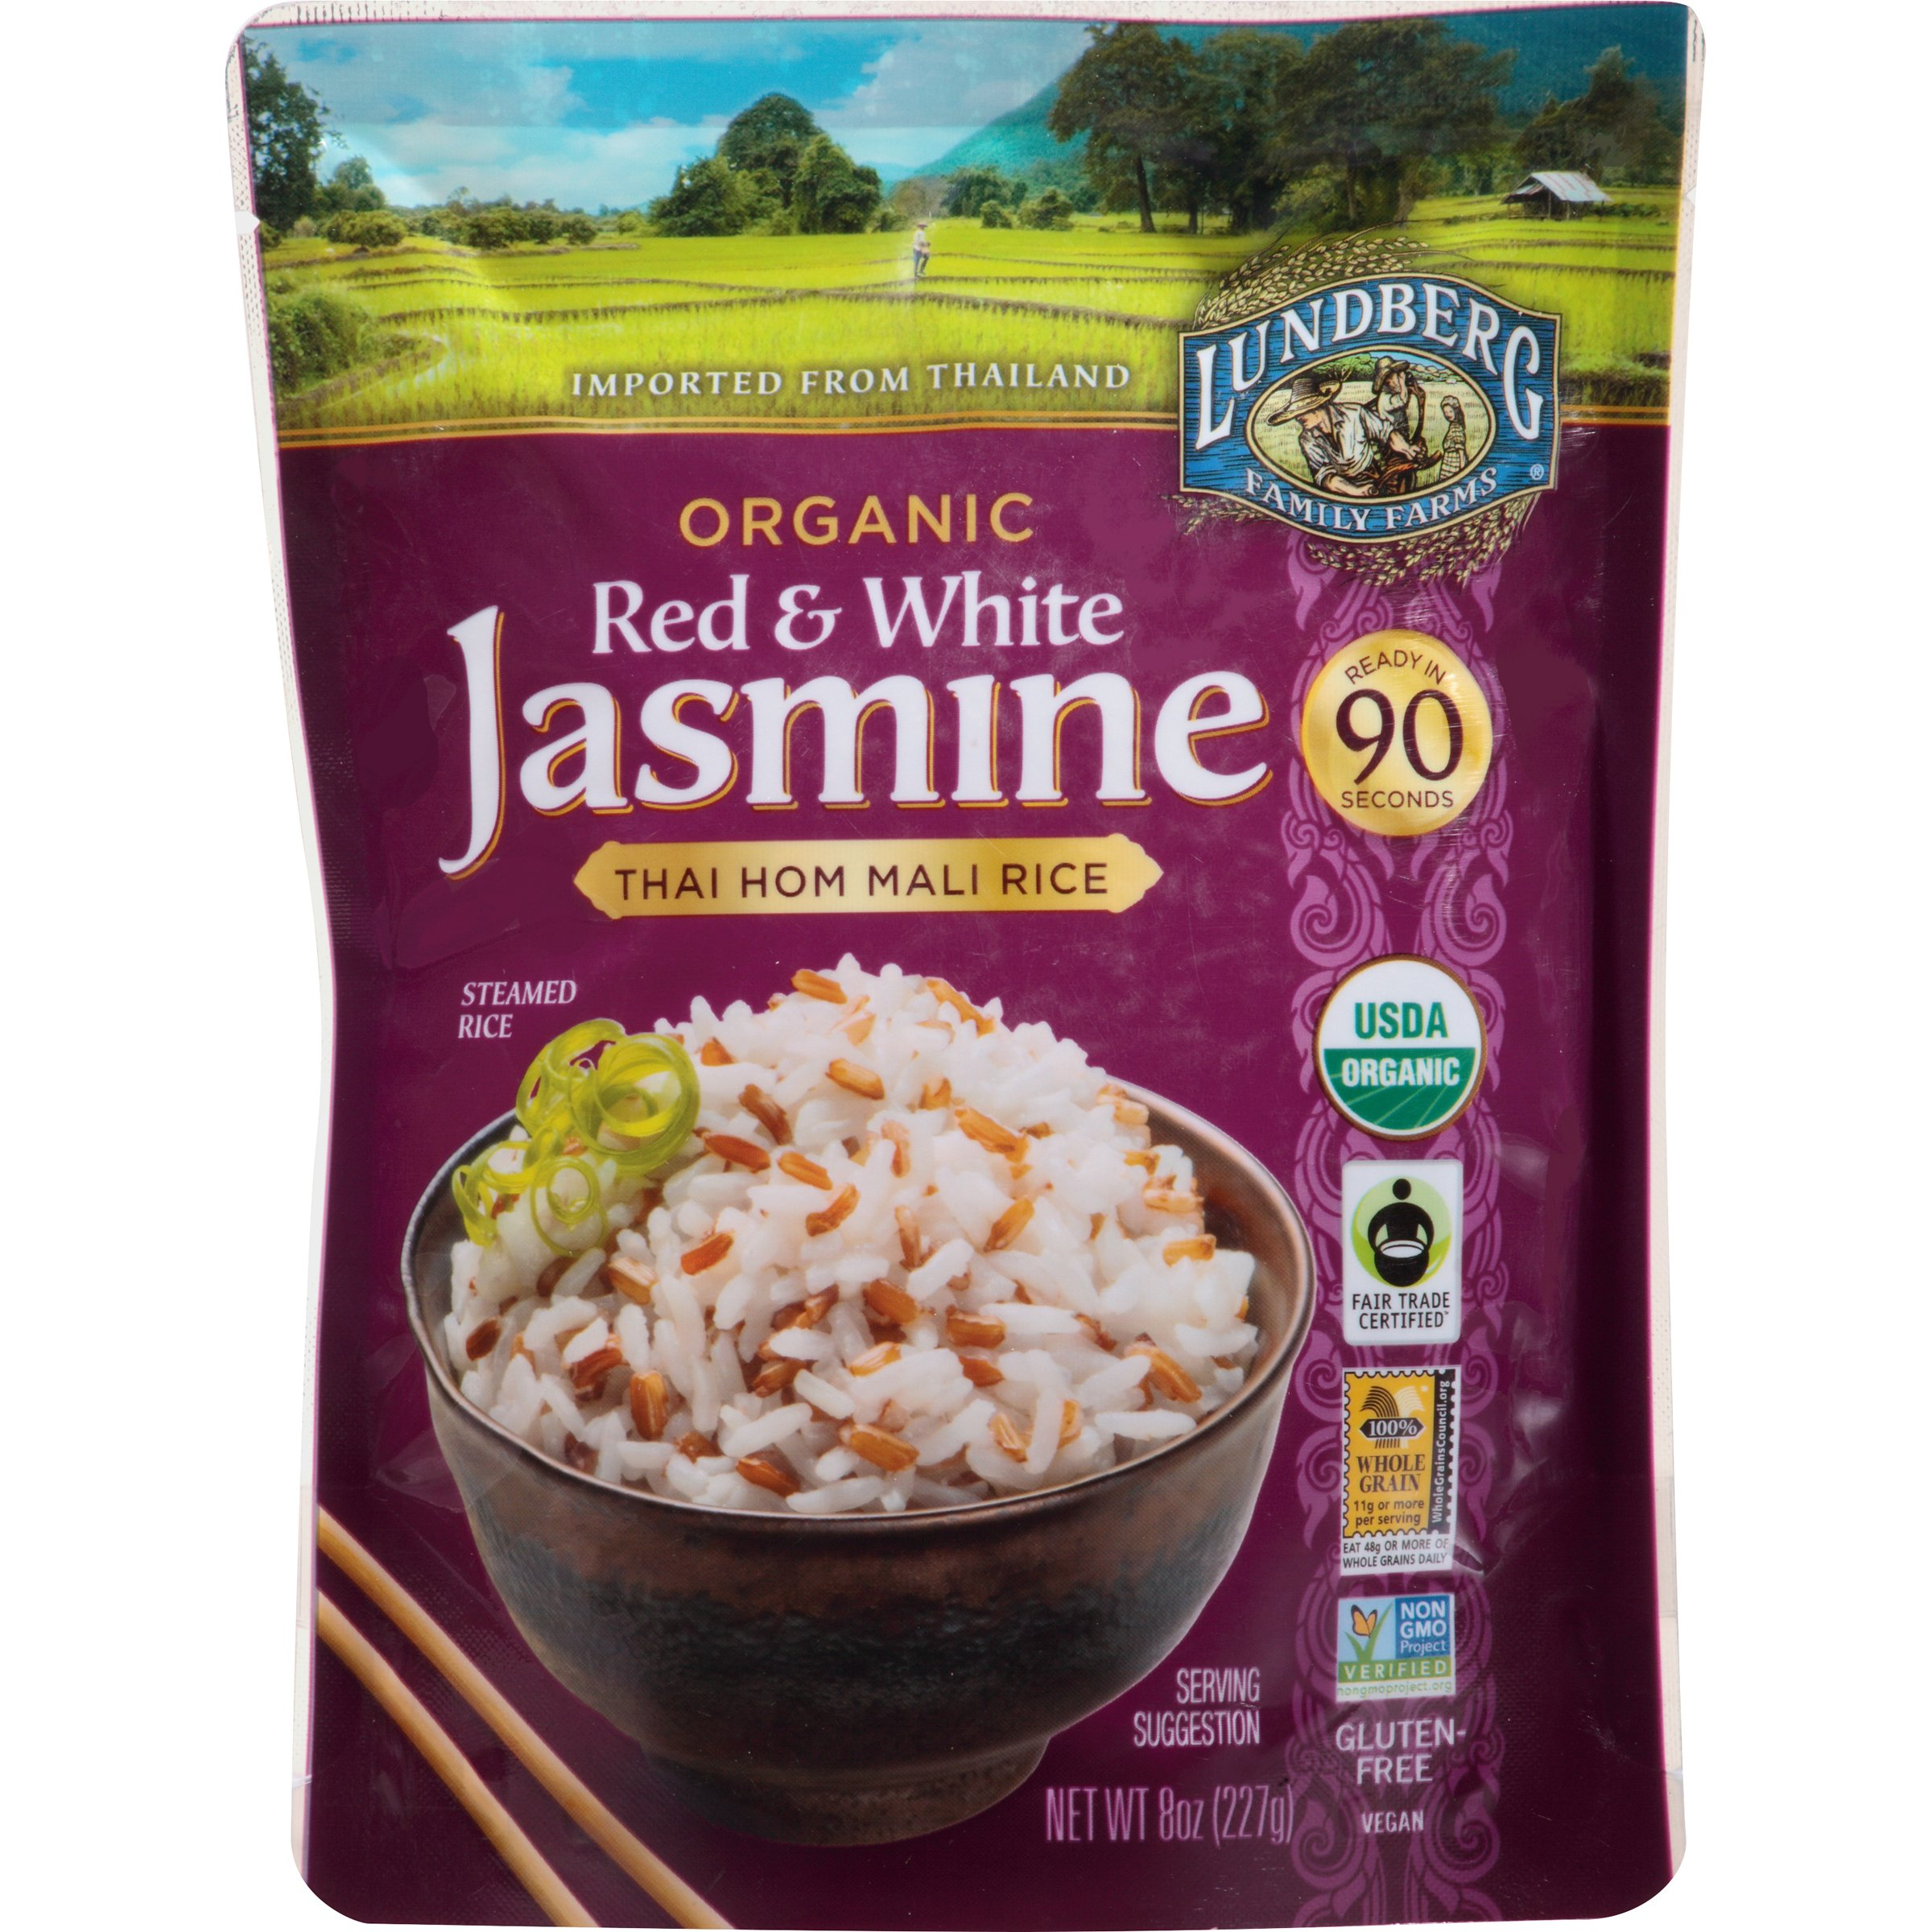 Amazon.com : Lundberg Family Farms Organic Brown Jasmine